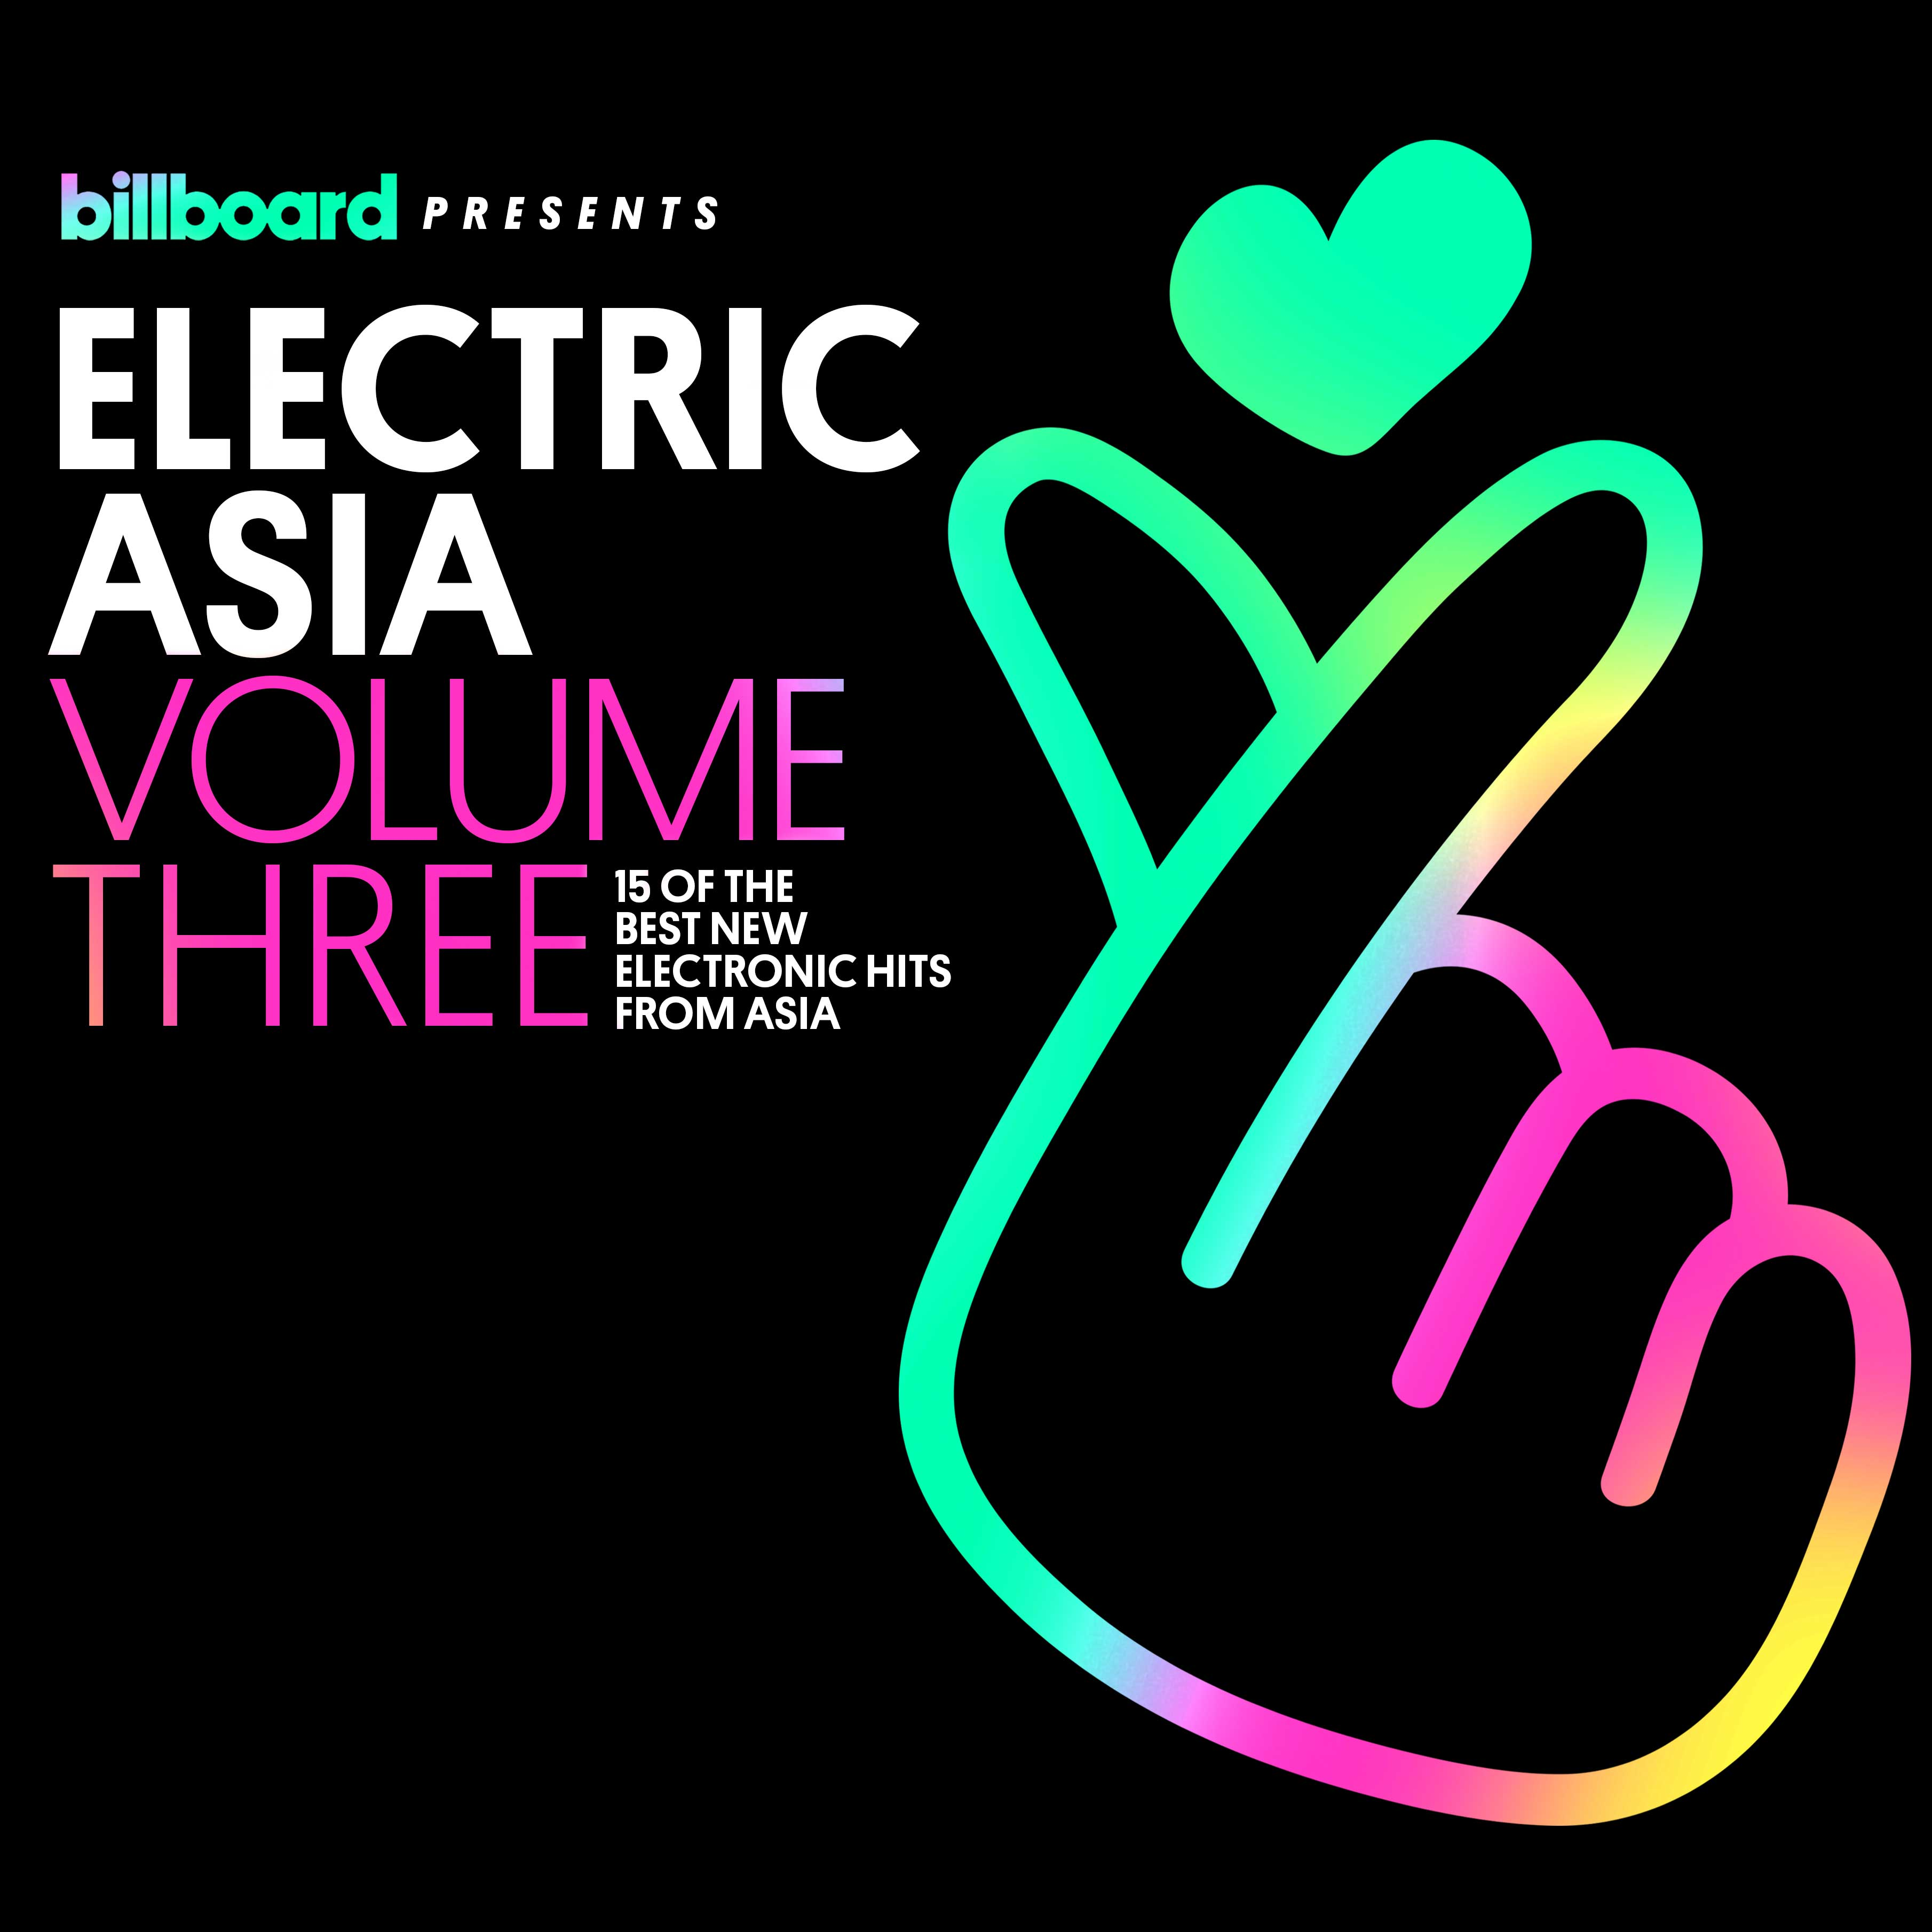 Billboard Presents Electric Asia Vol 3